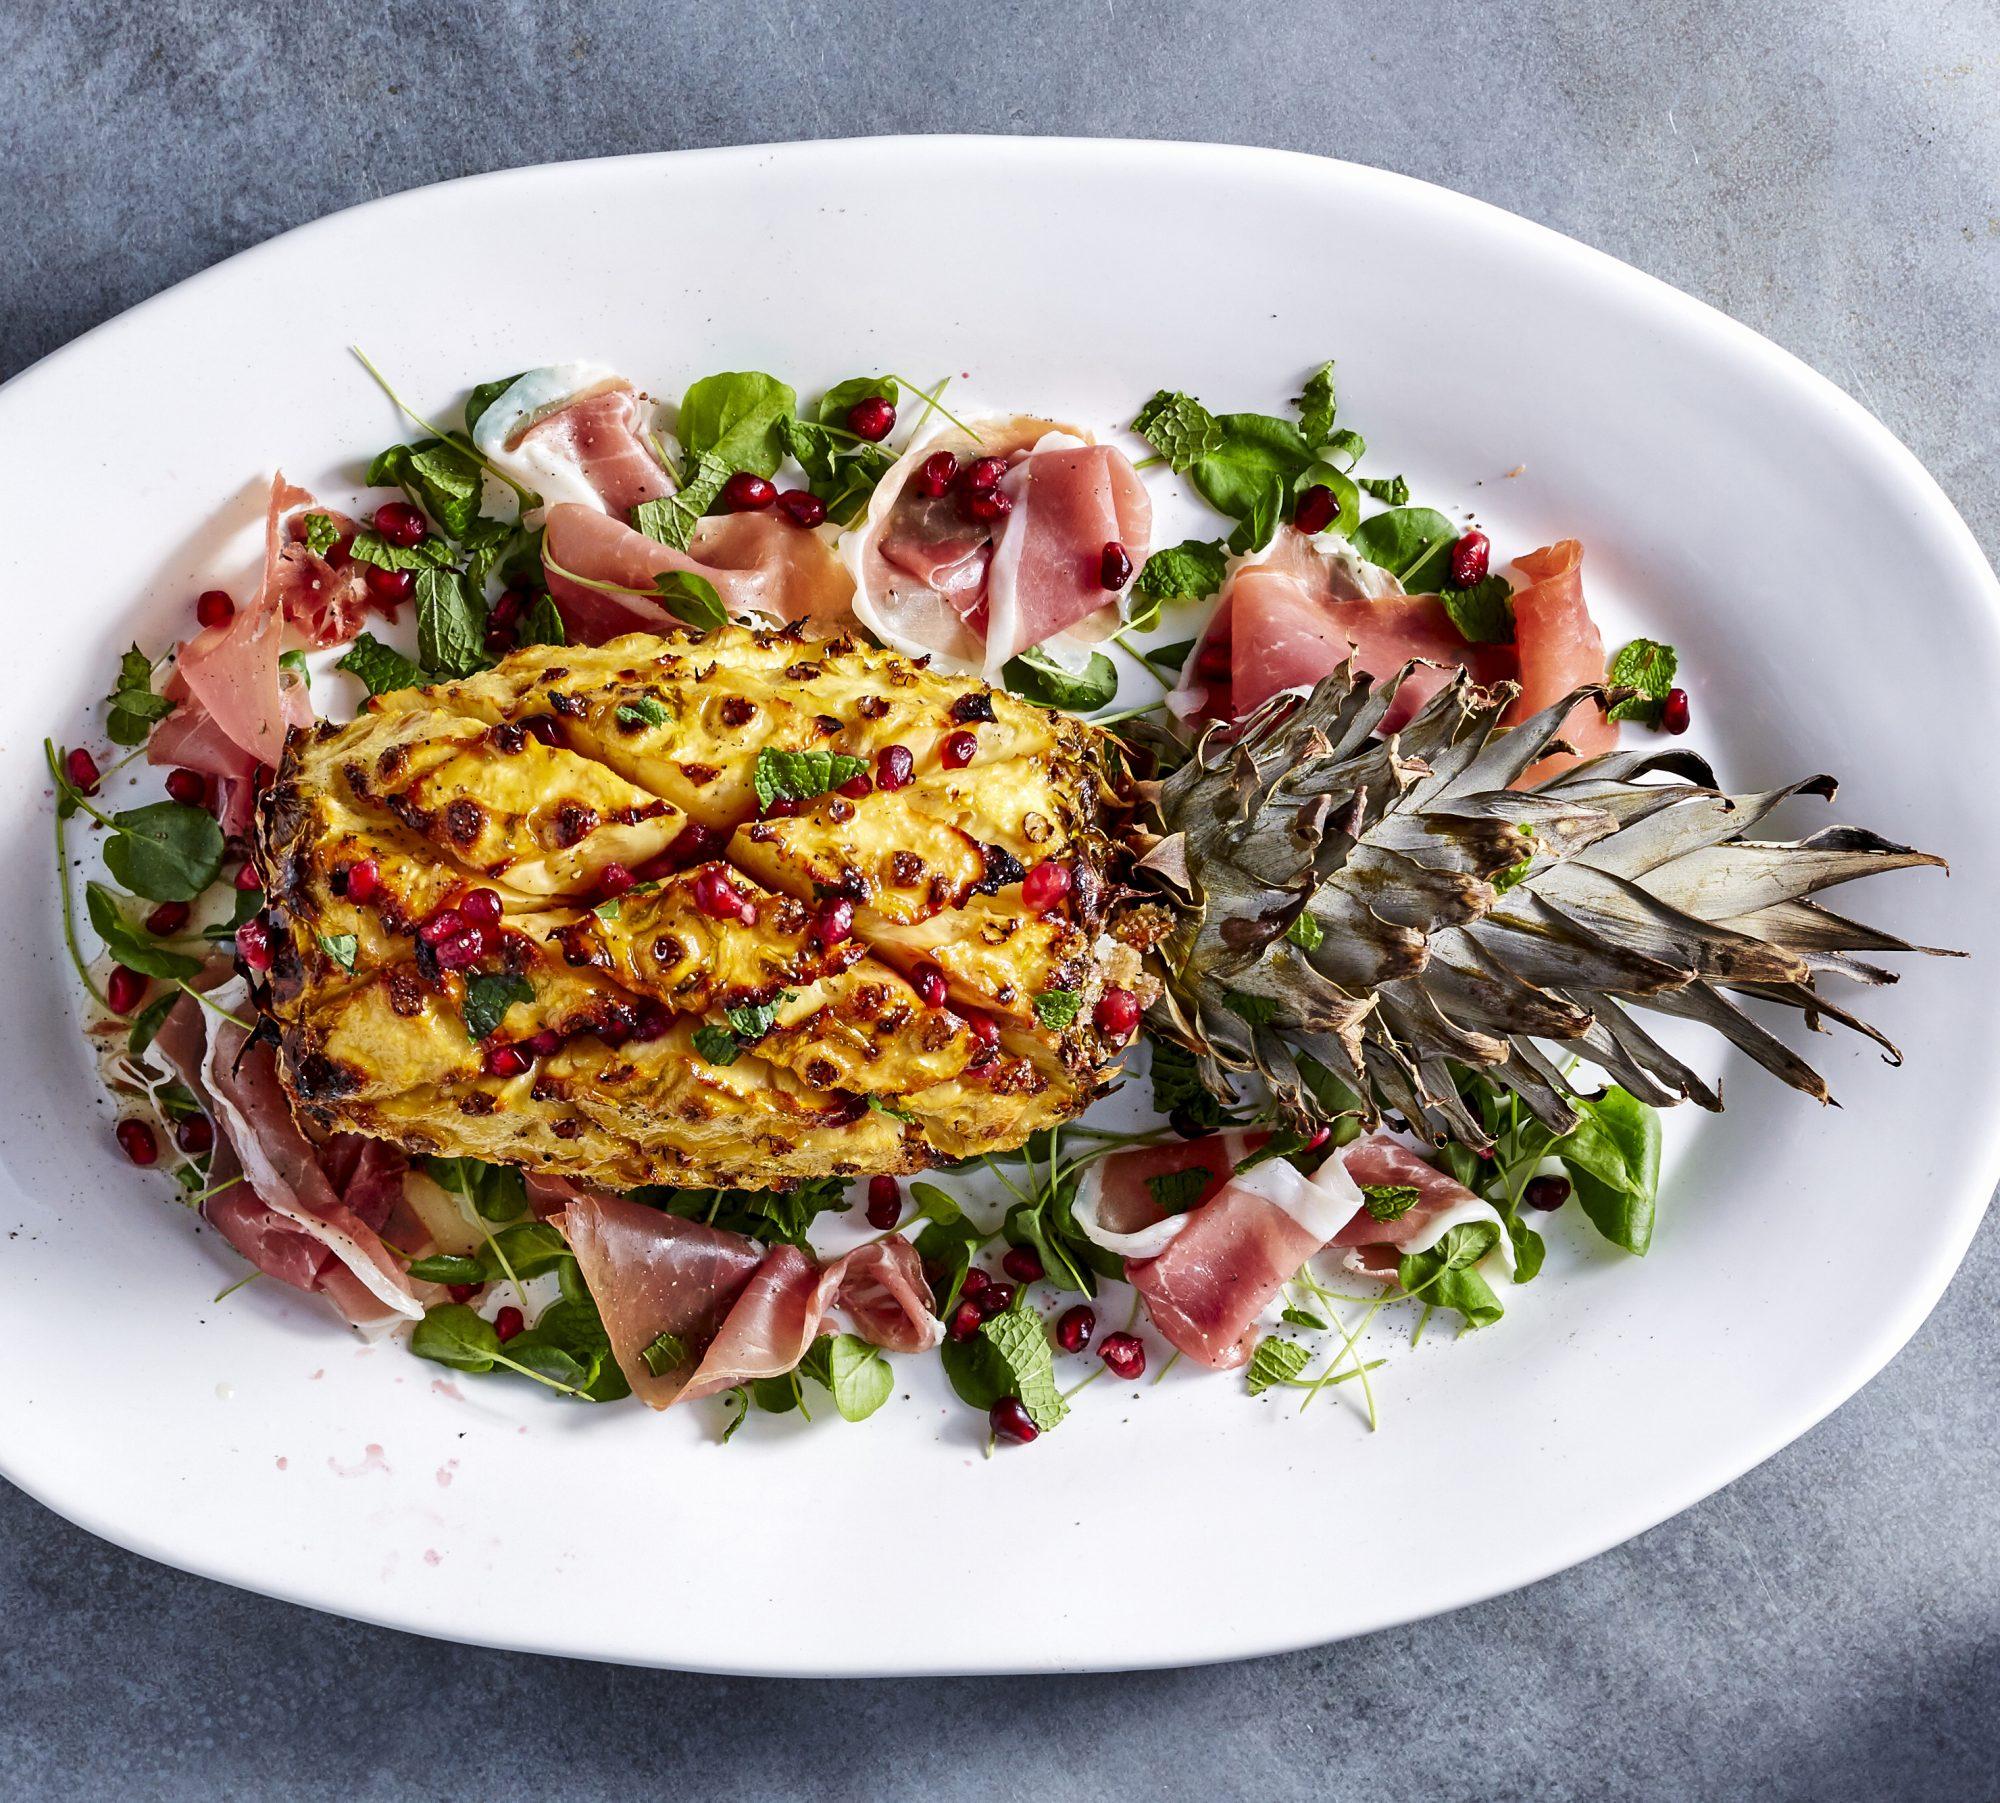 ham-cured-pineapple-horizontal-image